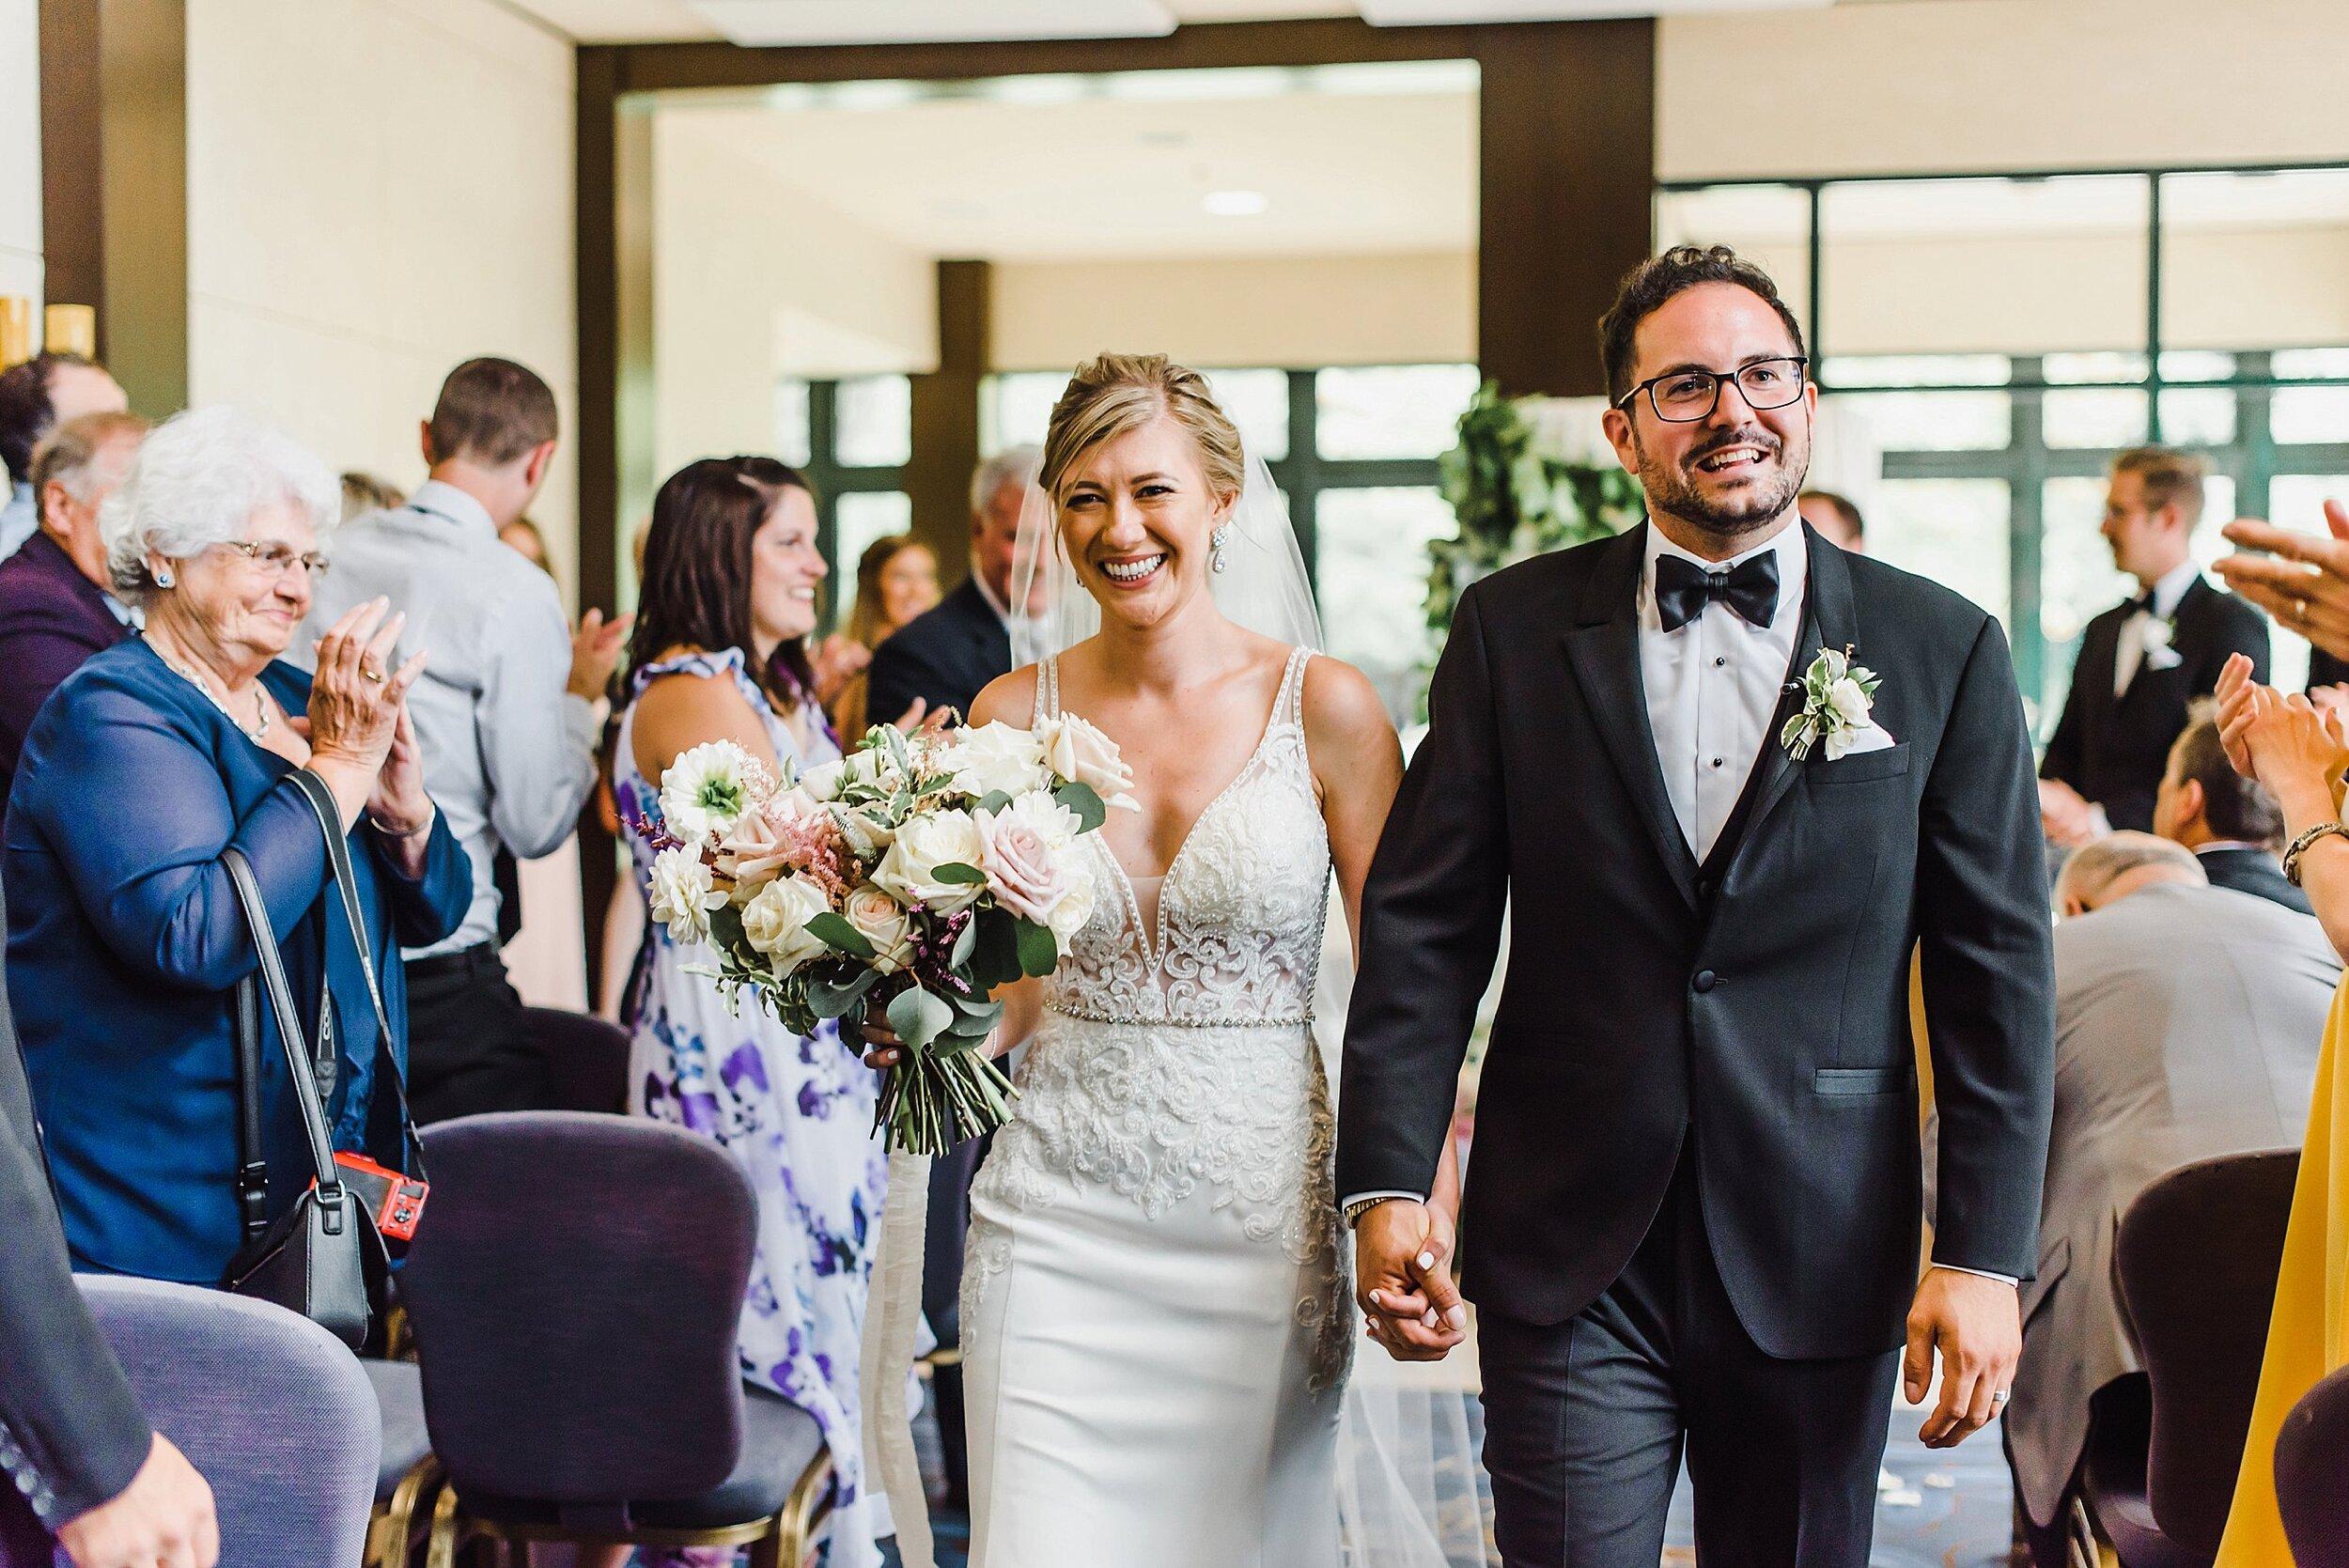 light airy fine art ottawa wedding photographer | Ali and Batoul Photography | Fairmont Le Chateau Montebello40.jpg